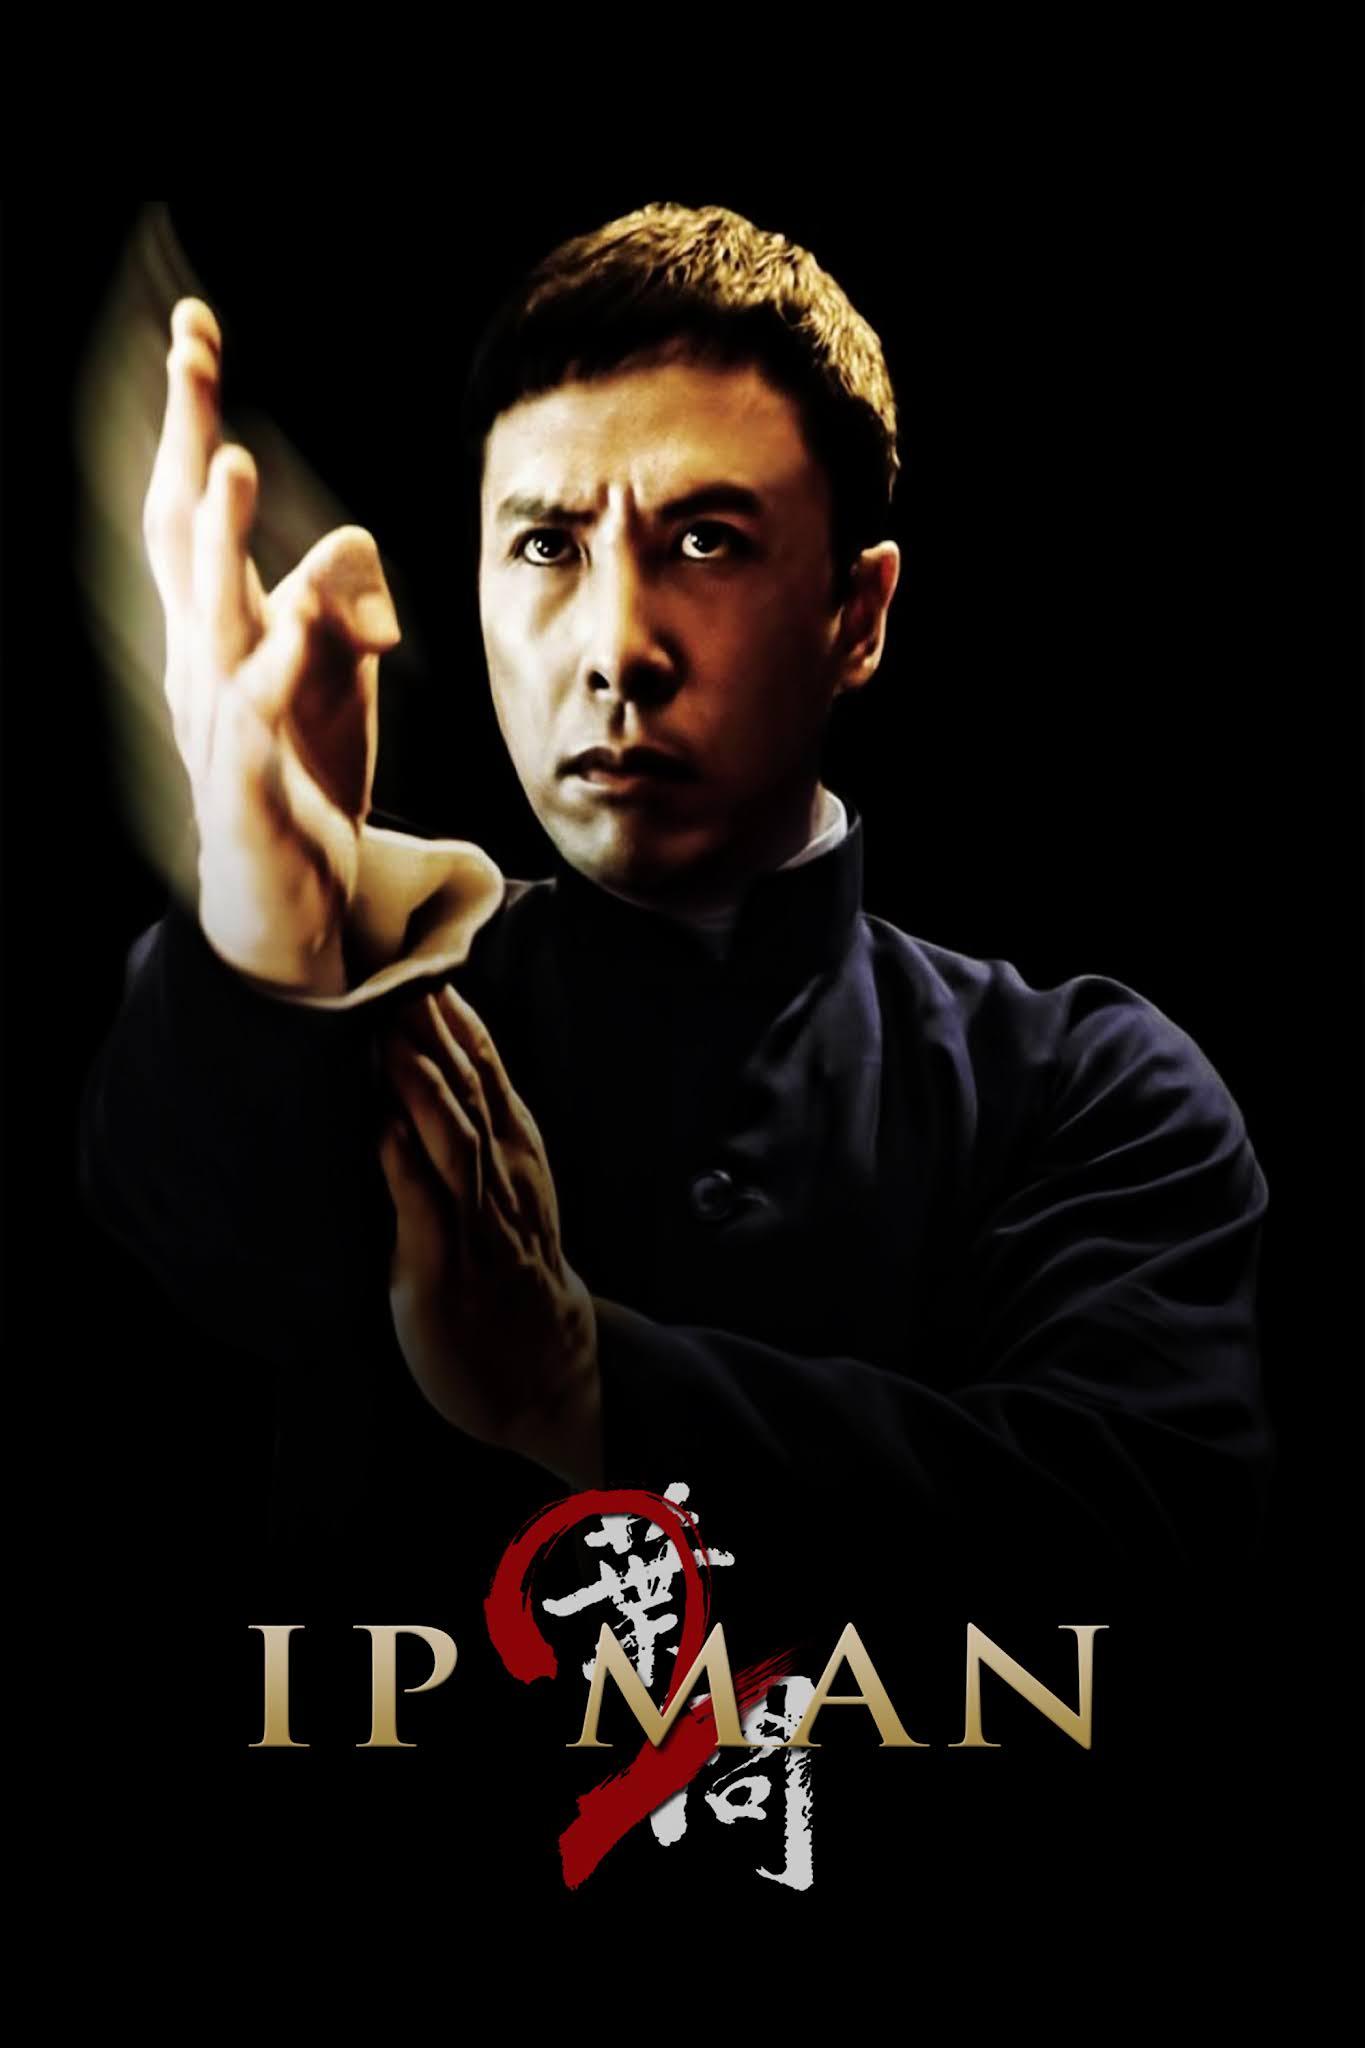 Download Ip Man 2 (2010) Full Movie in Hindi Dual Audio BluRay 720p [900MB]